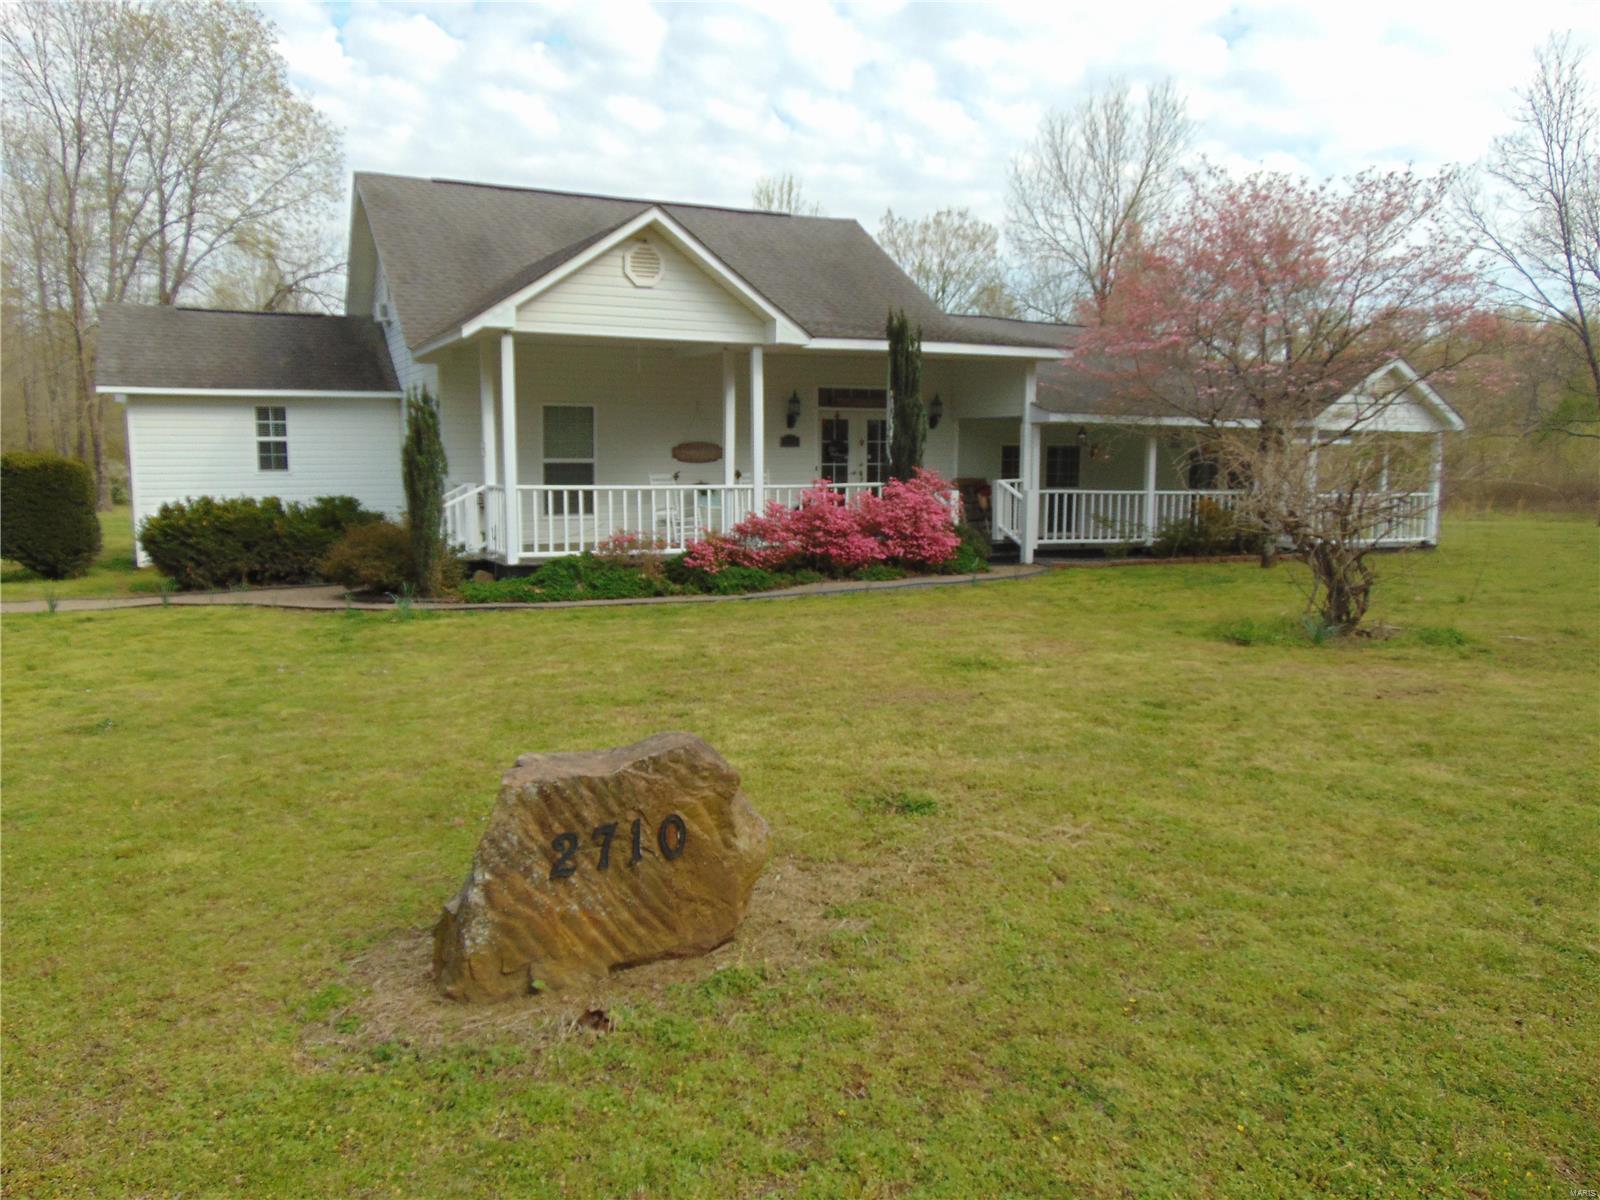 1560 Ripley 142E-28 Property Photo - Doniphan, MO real estate listing